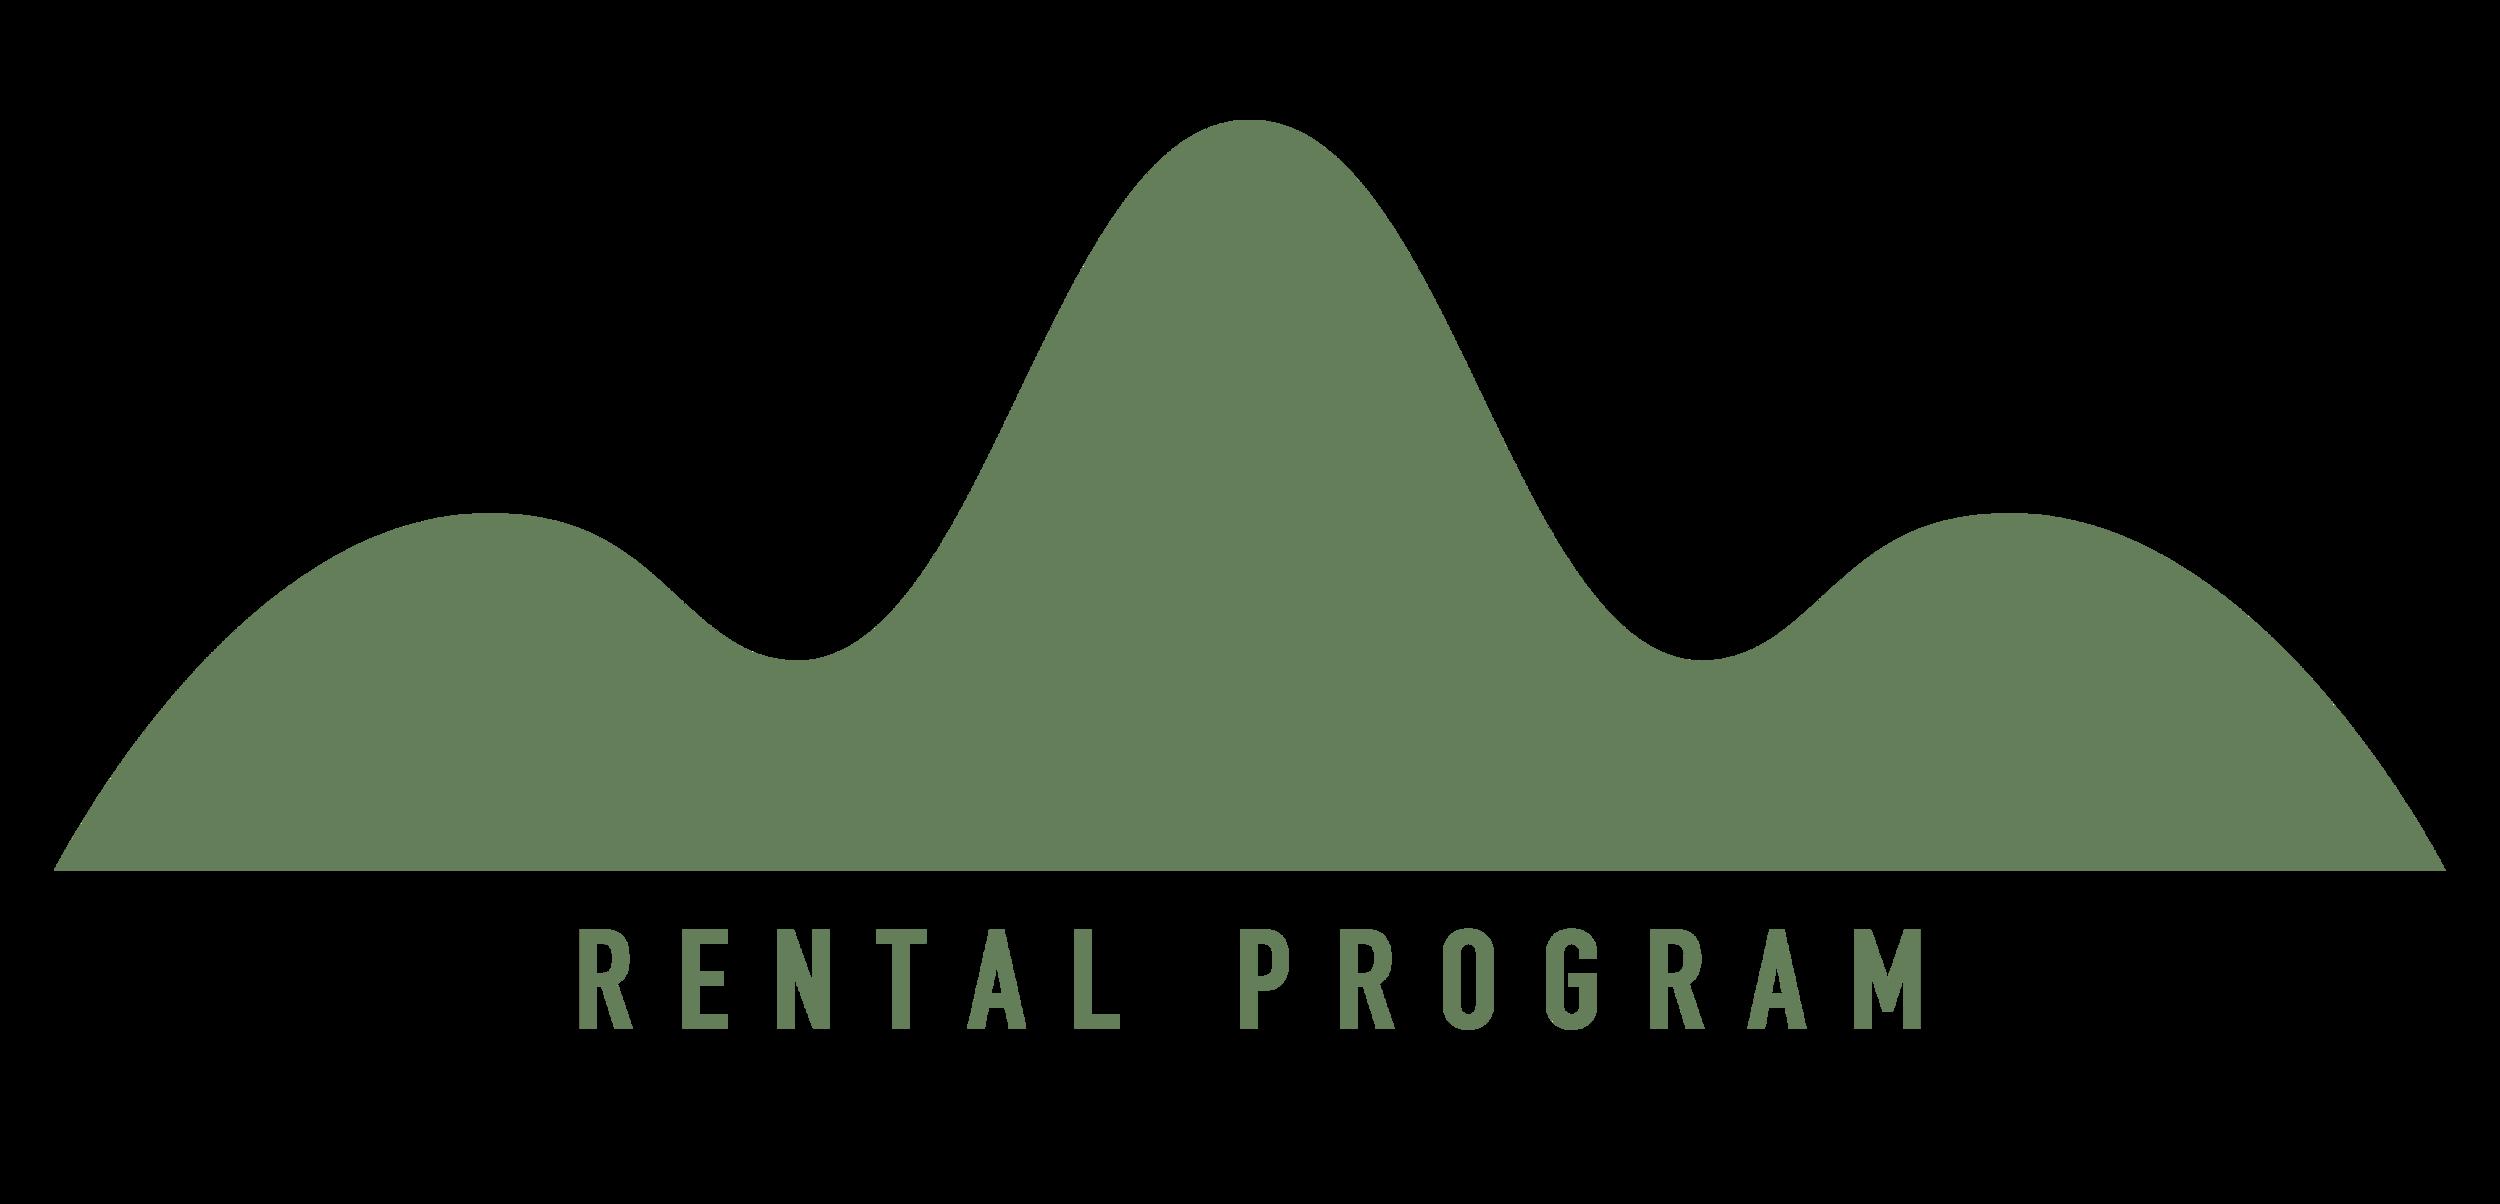 RENTAL PROGRAM.png